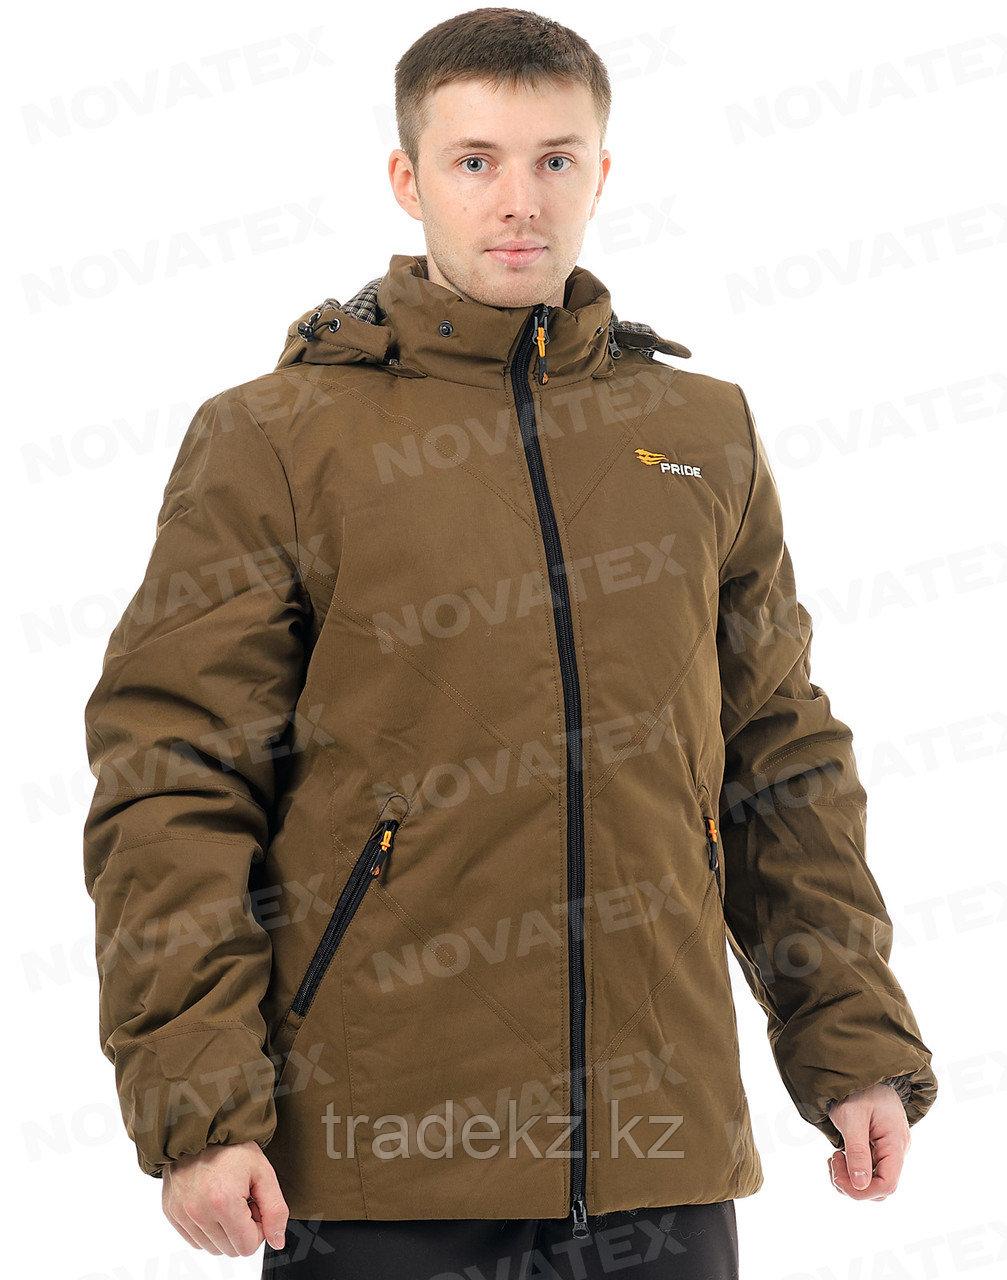 Куртка, парка зимняя Novatex Таганай (ткань граф, коричневый), размер 56-58